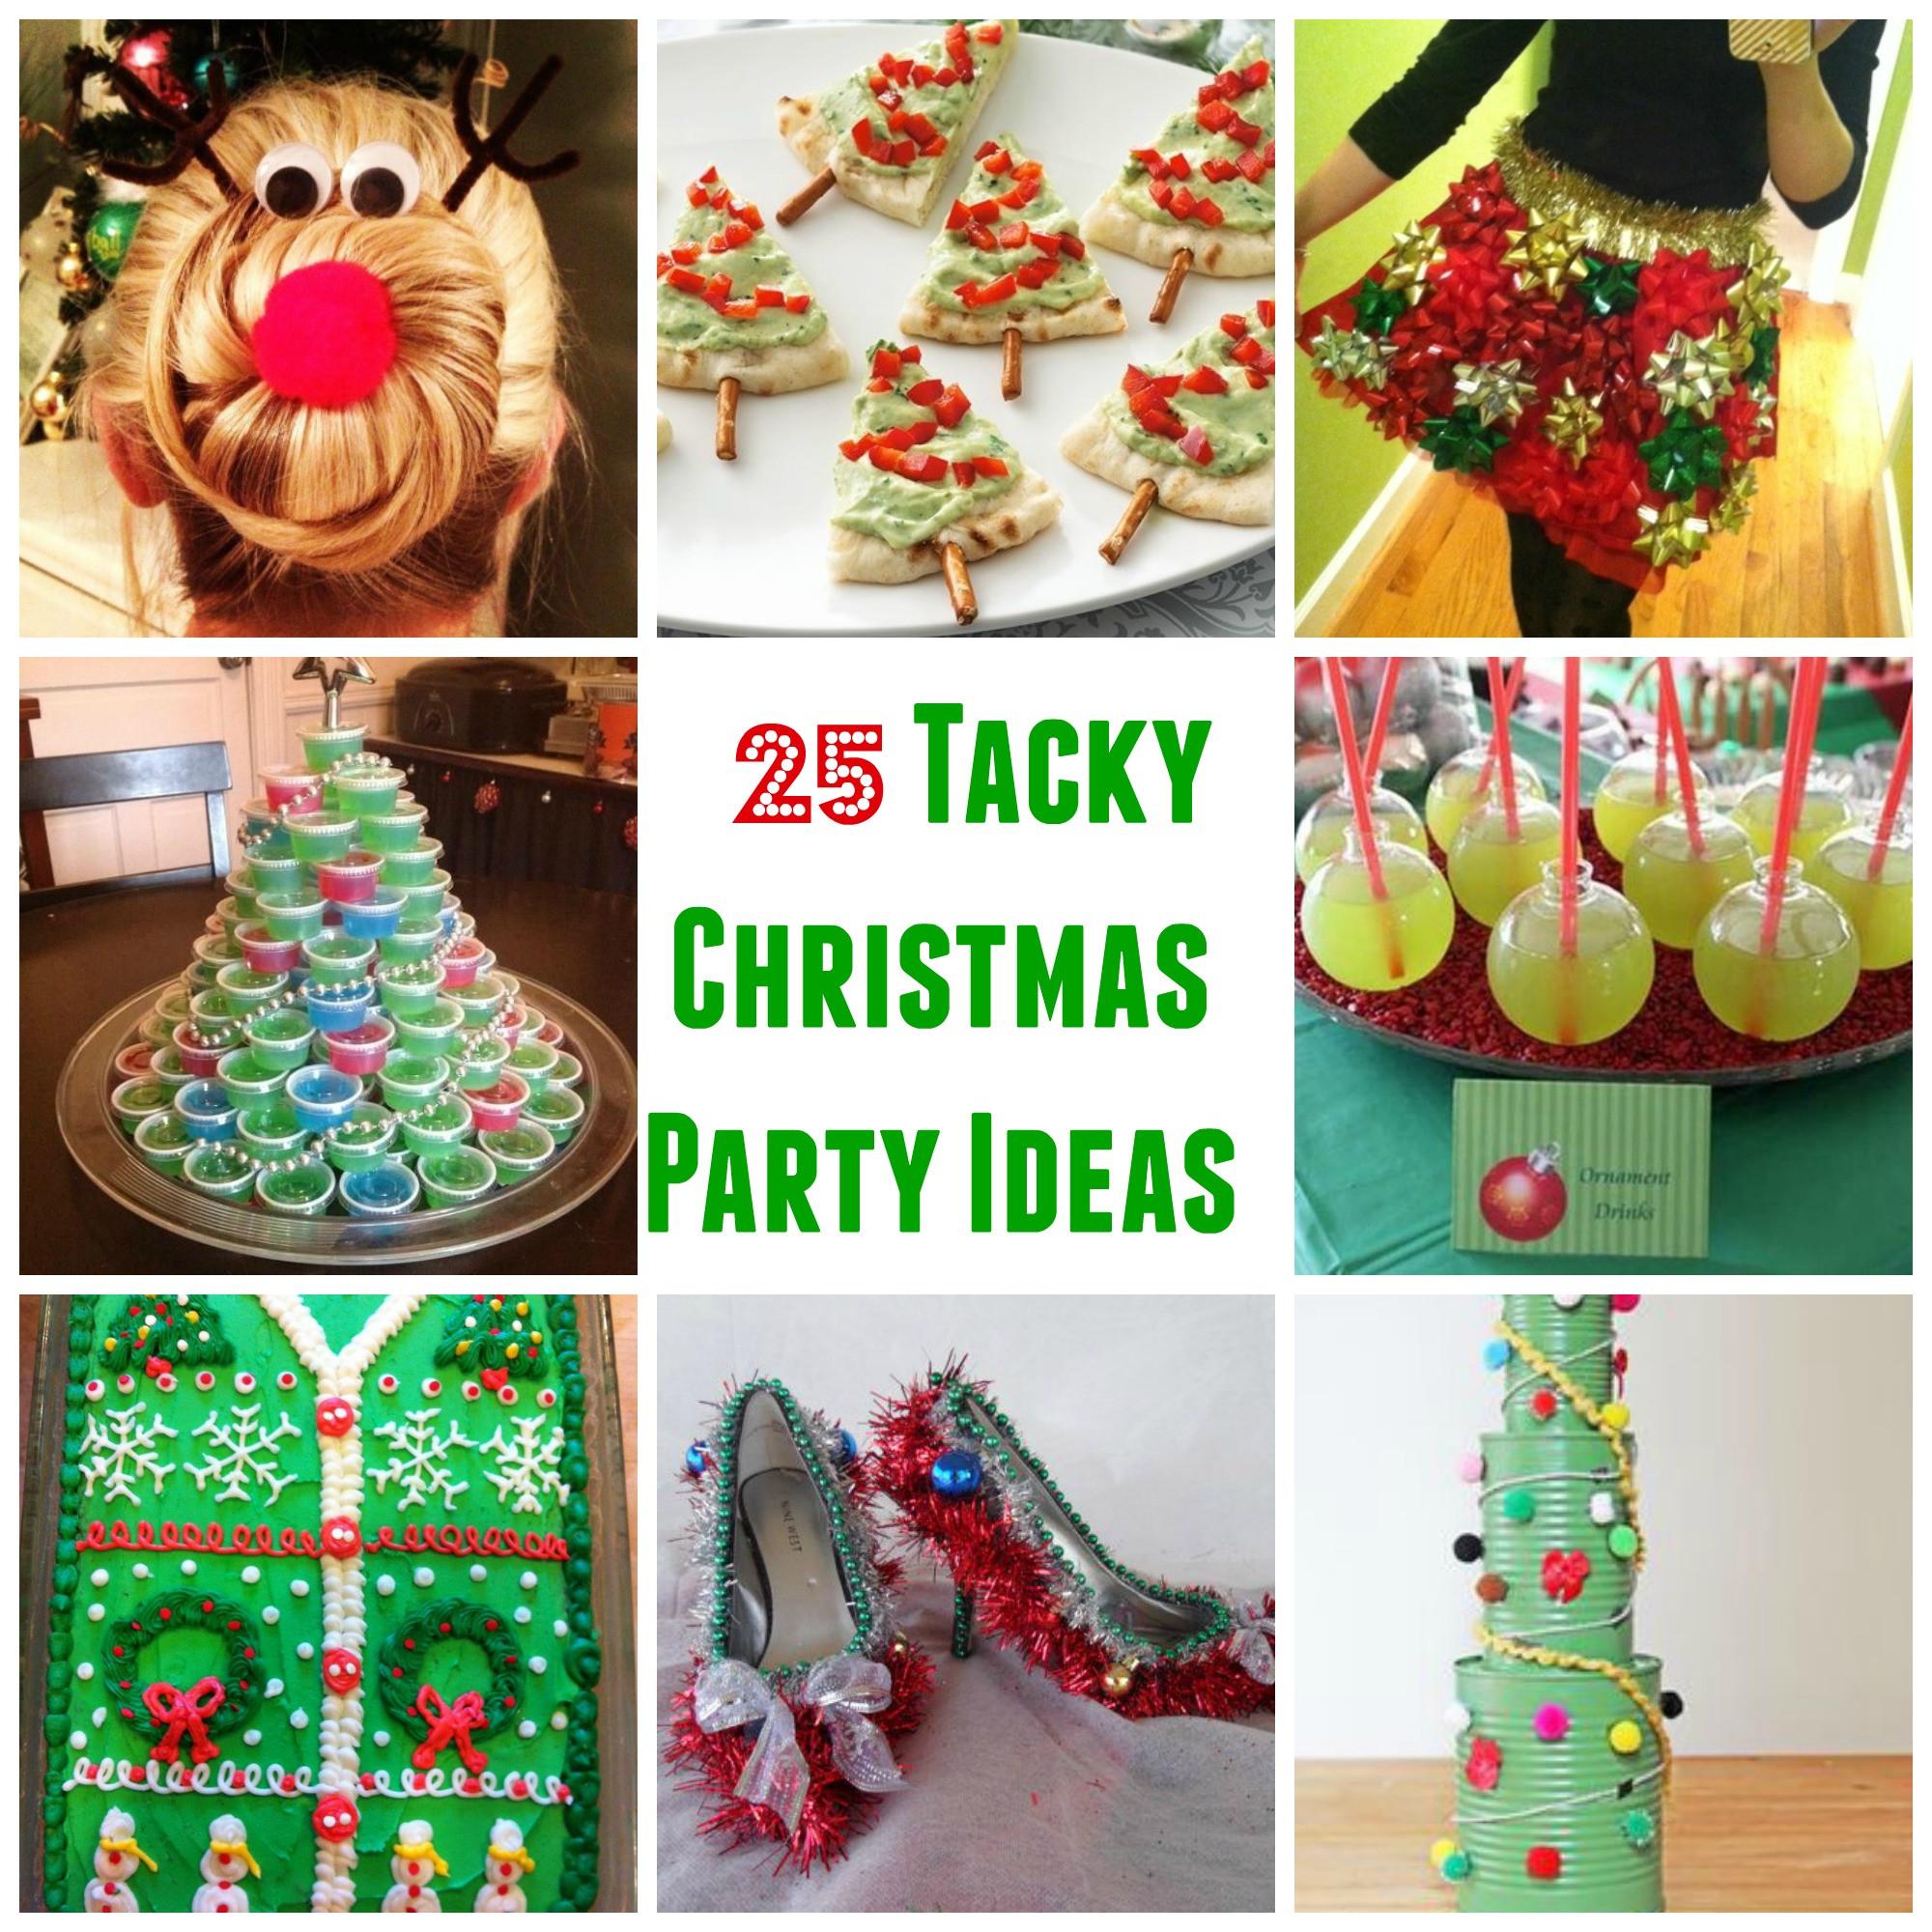 Tacky Christmas Party Ideas  25 Genius Tacky Christmas Party Ideas Sarah Scoop